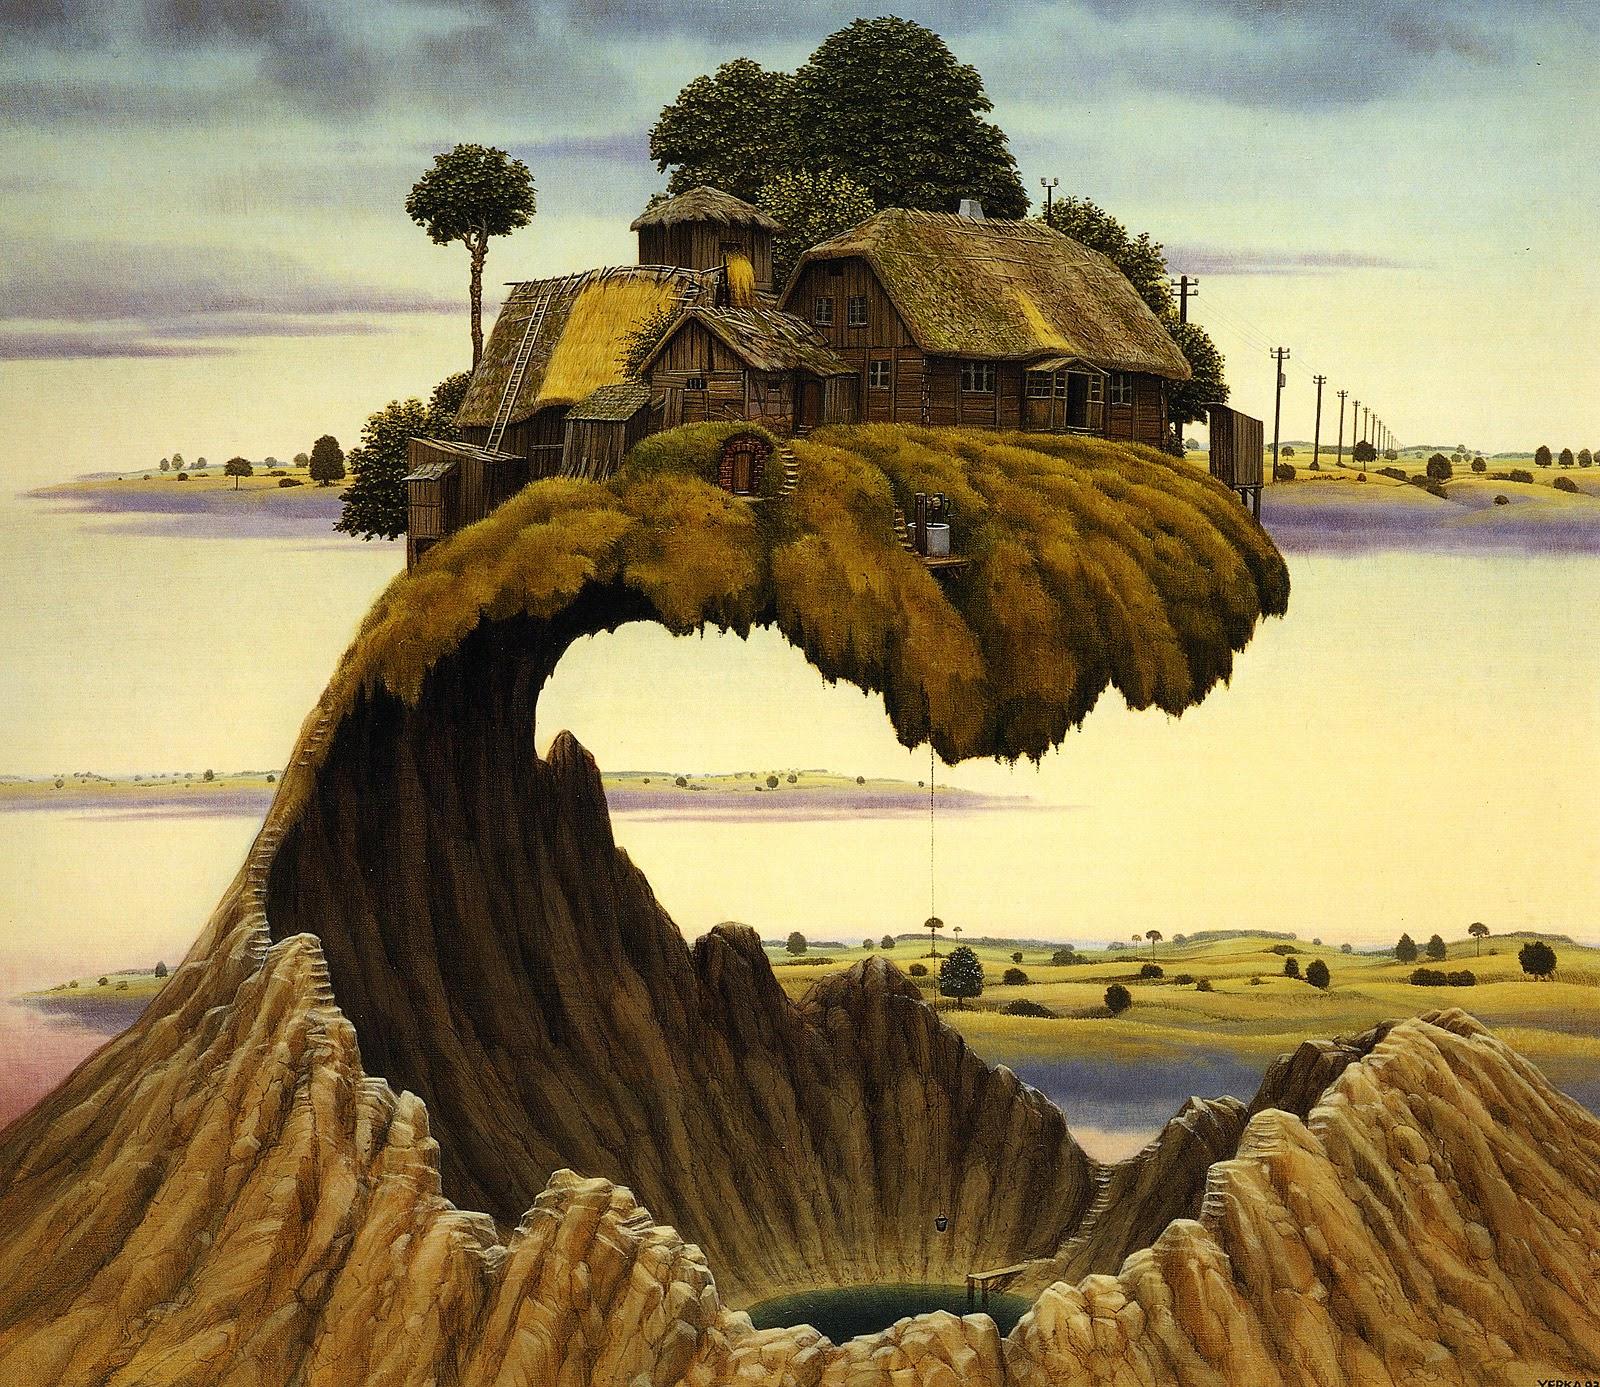 Mantenha Silêncio - Jacek Yerka e seu surrealismo fantástico ~ Polonês